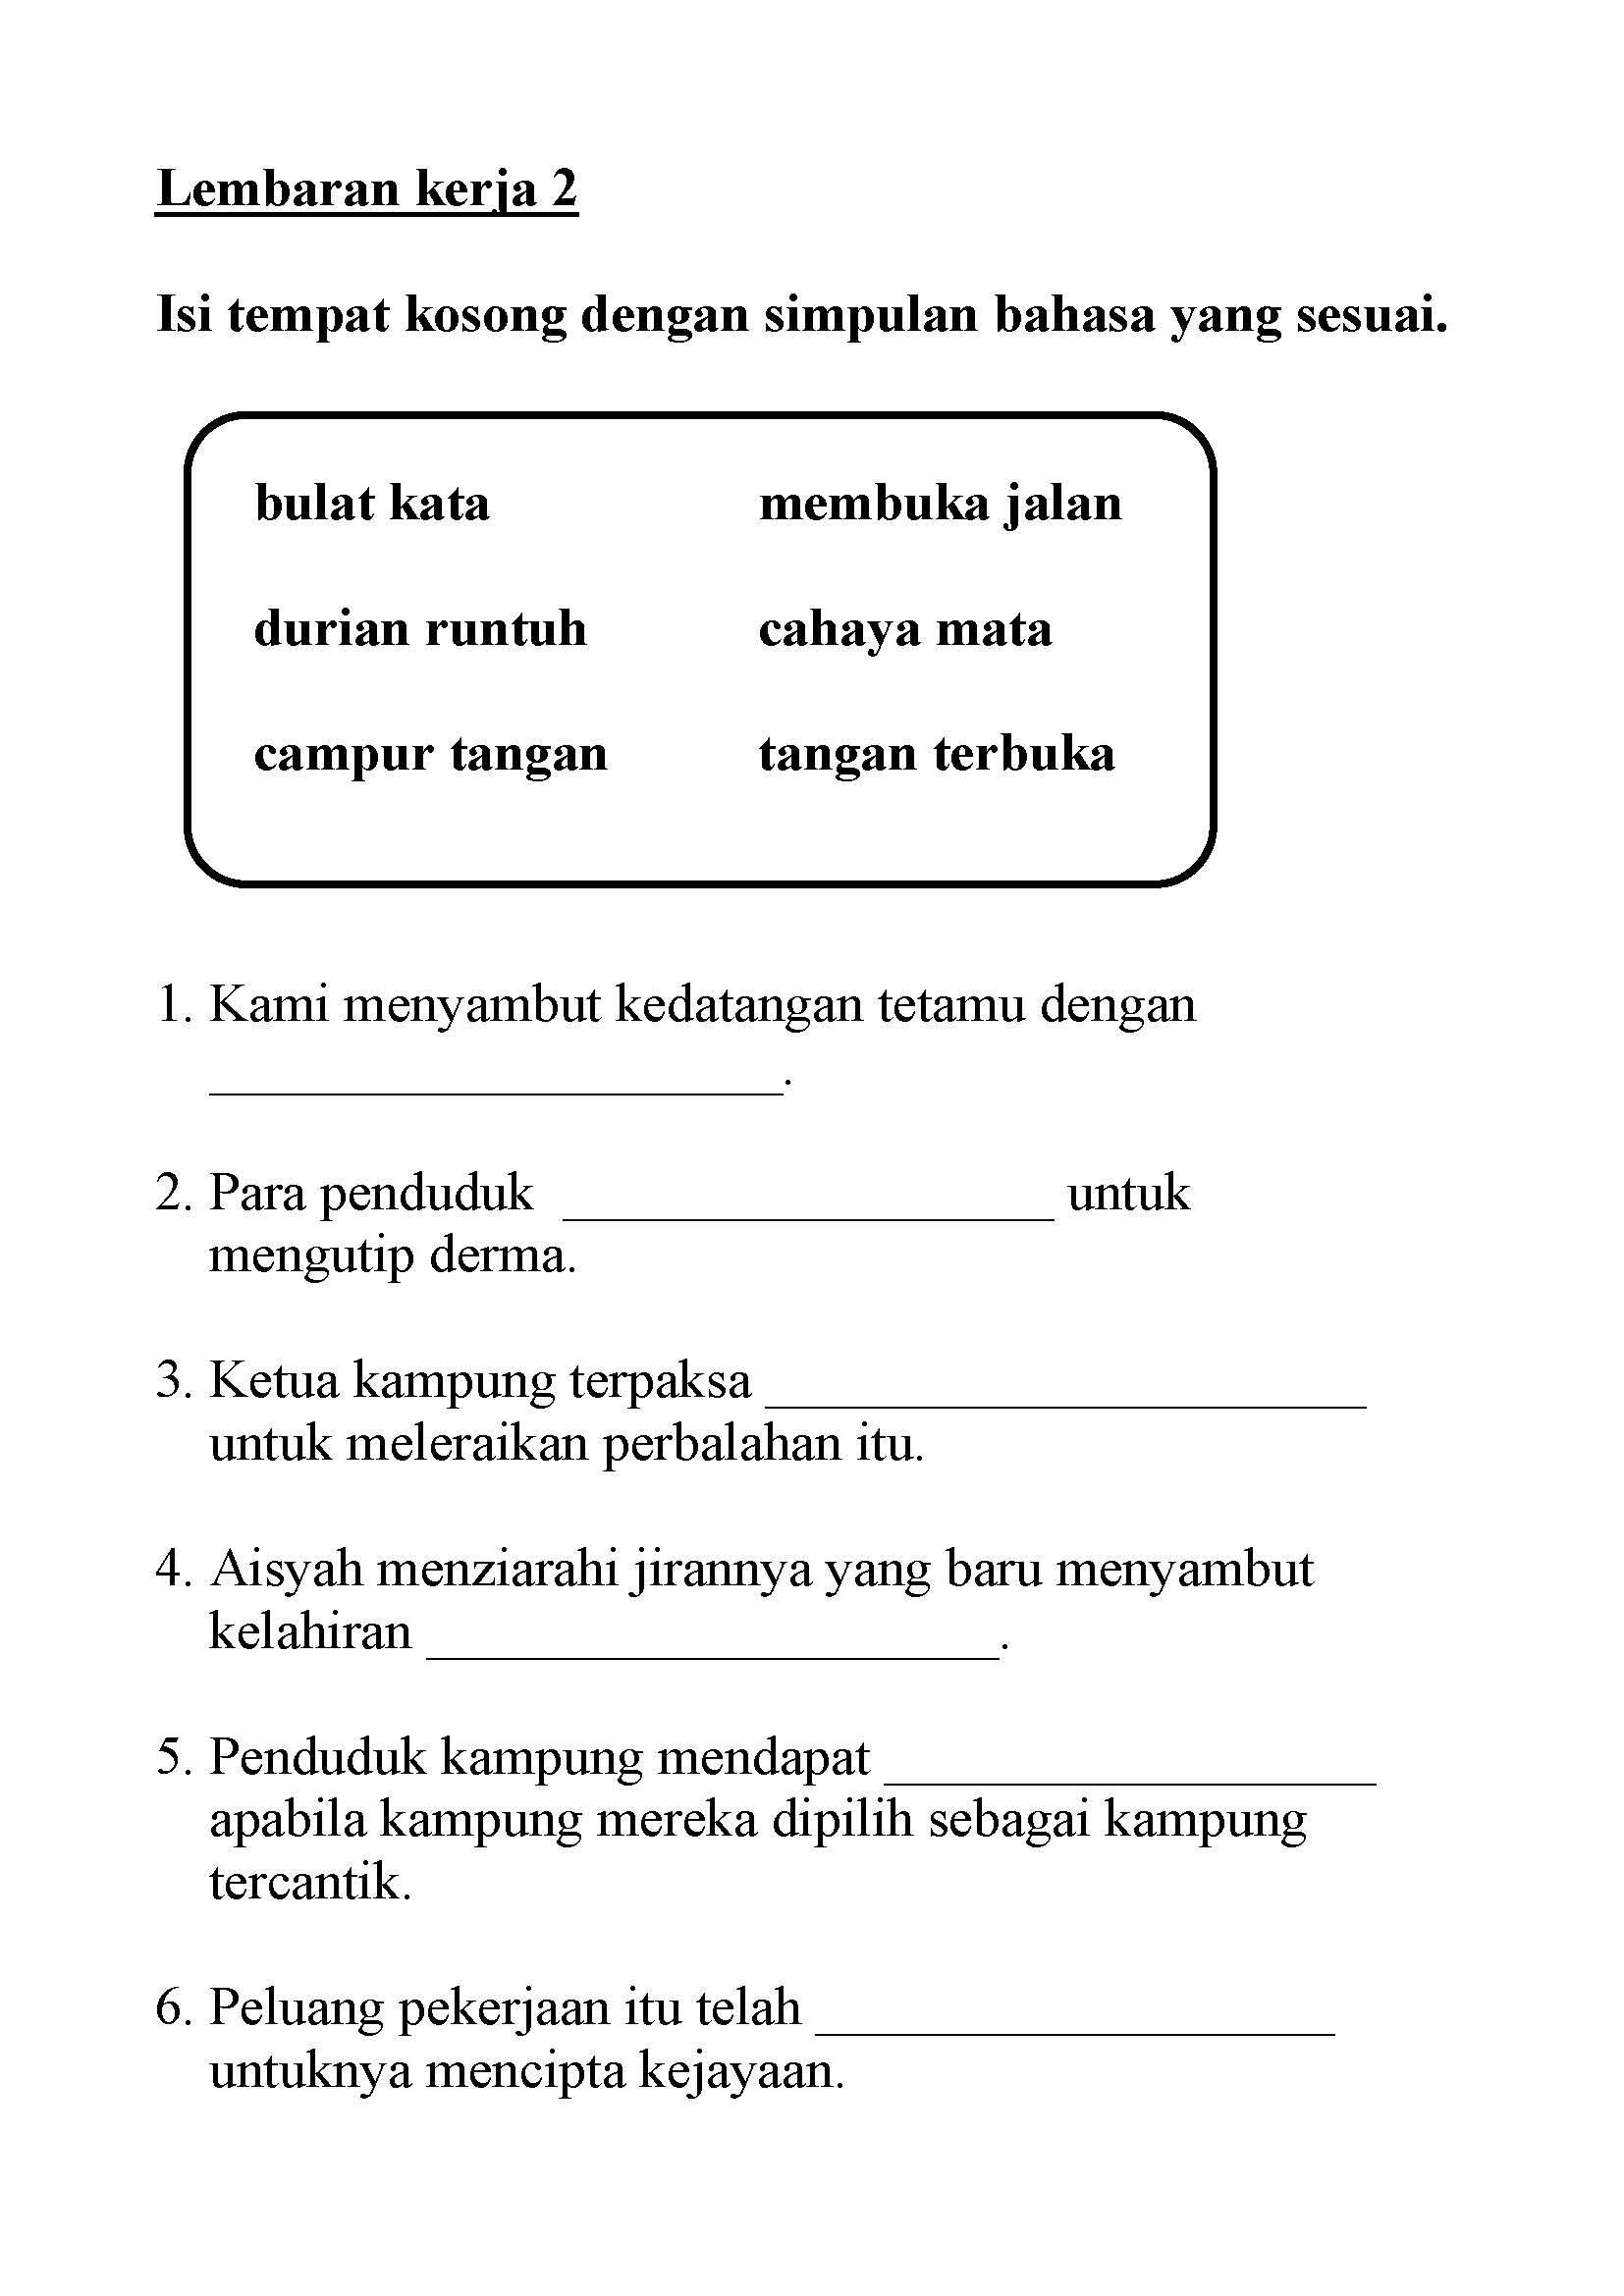 Image Result For Latihan Kata Adjektif Tahun 2